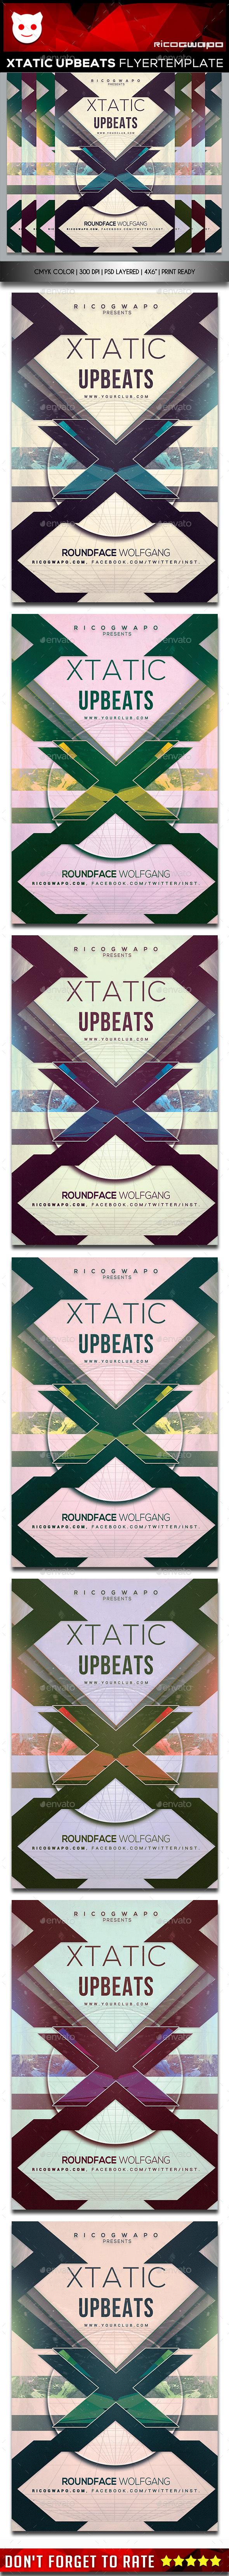 Xtatic Upbeat Flyer Template - Flyers Print Templates